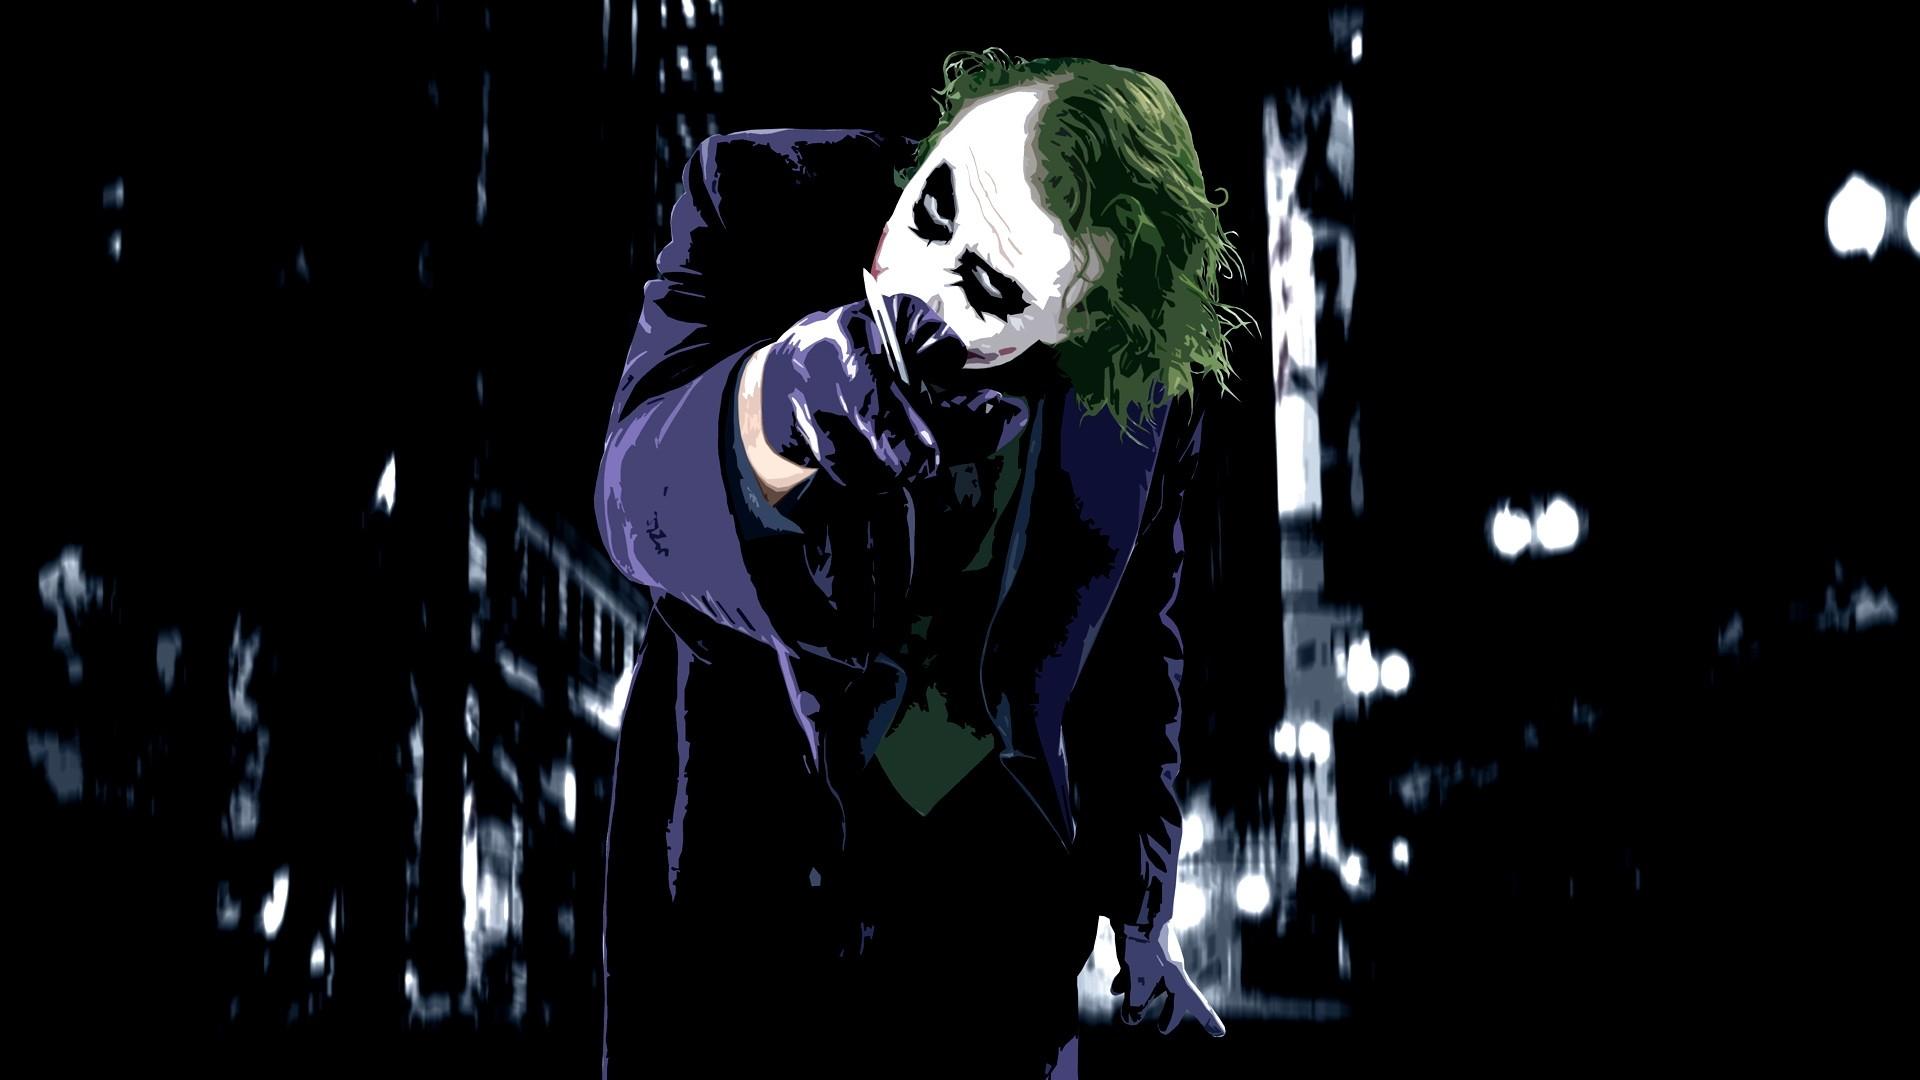 the joker wallpaper HD Download 1920×1080 The Joker Wallpaper (54 Wallpapers)  |